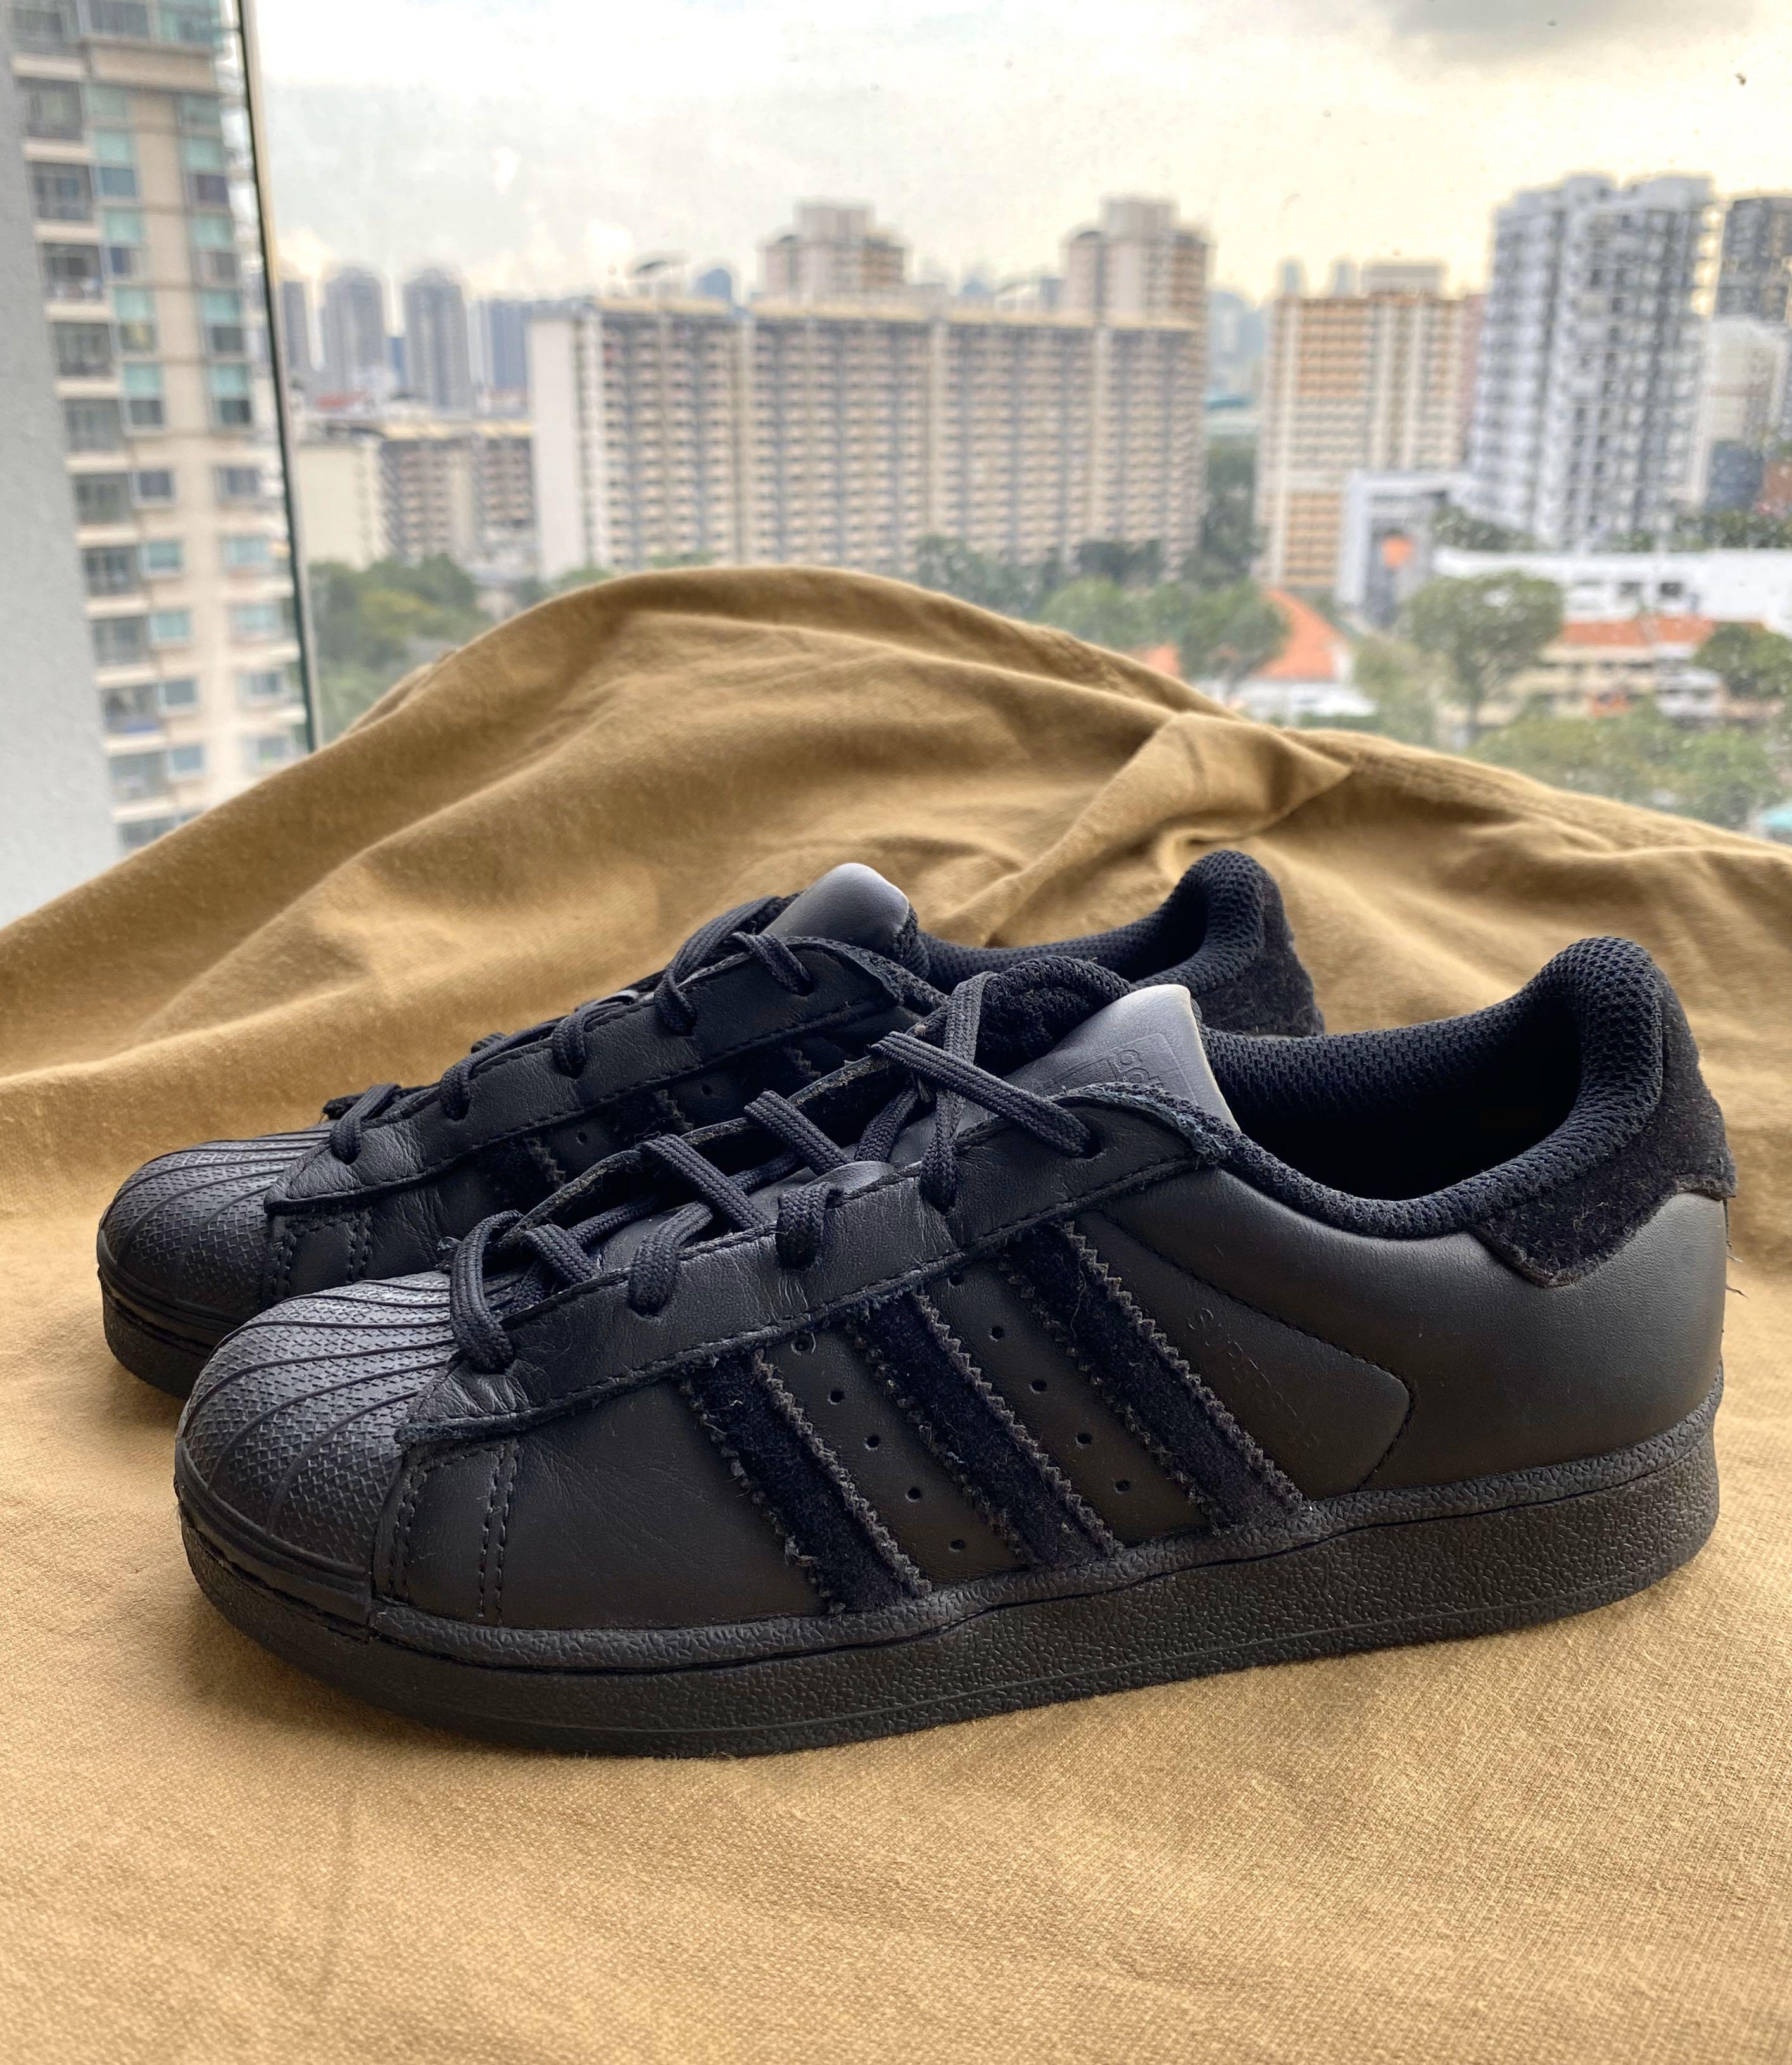 Adidas Superstar Full Black Kids Shoes